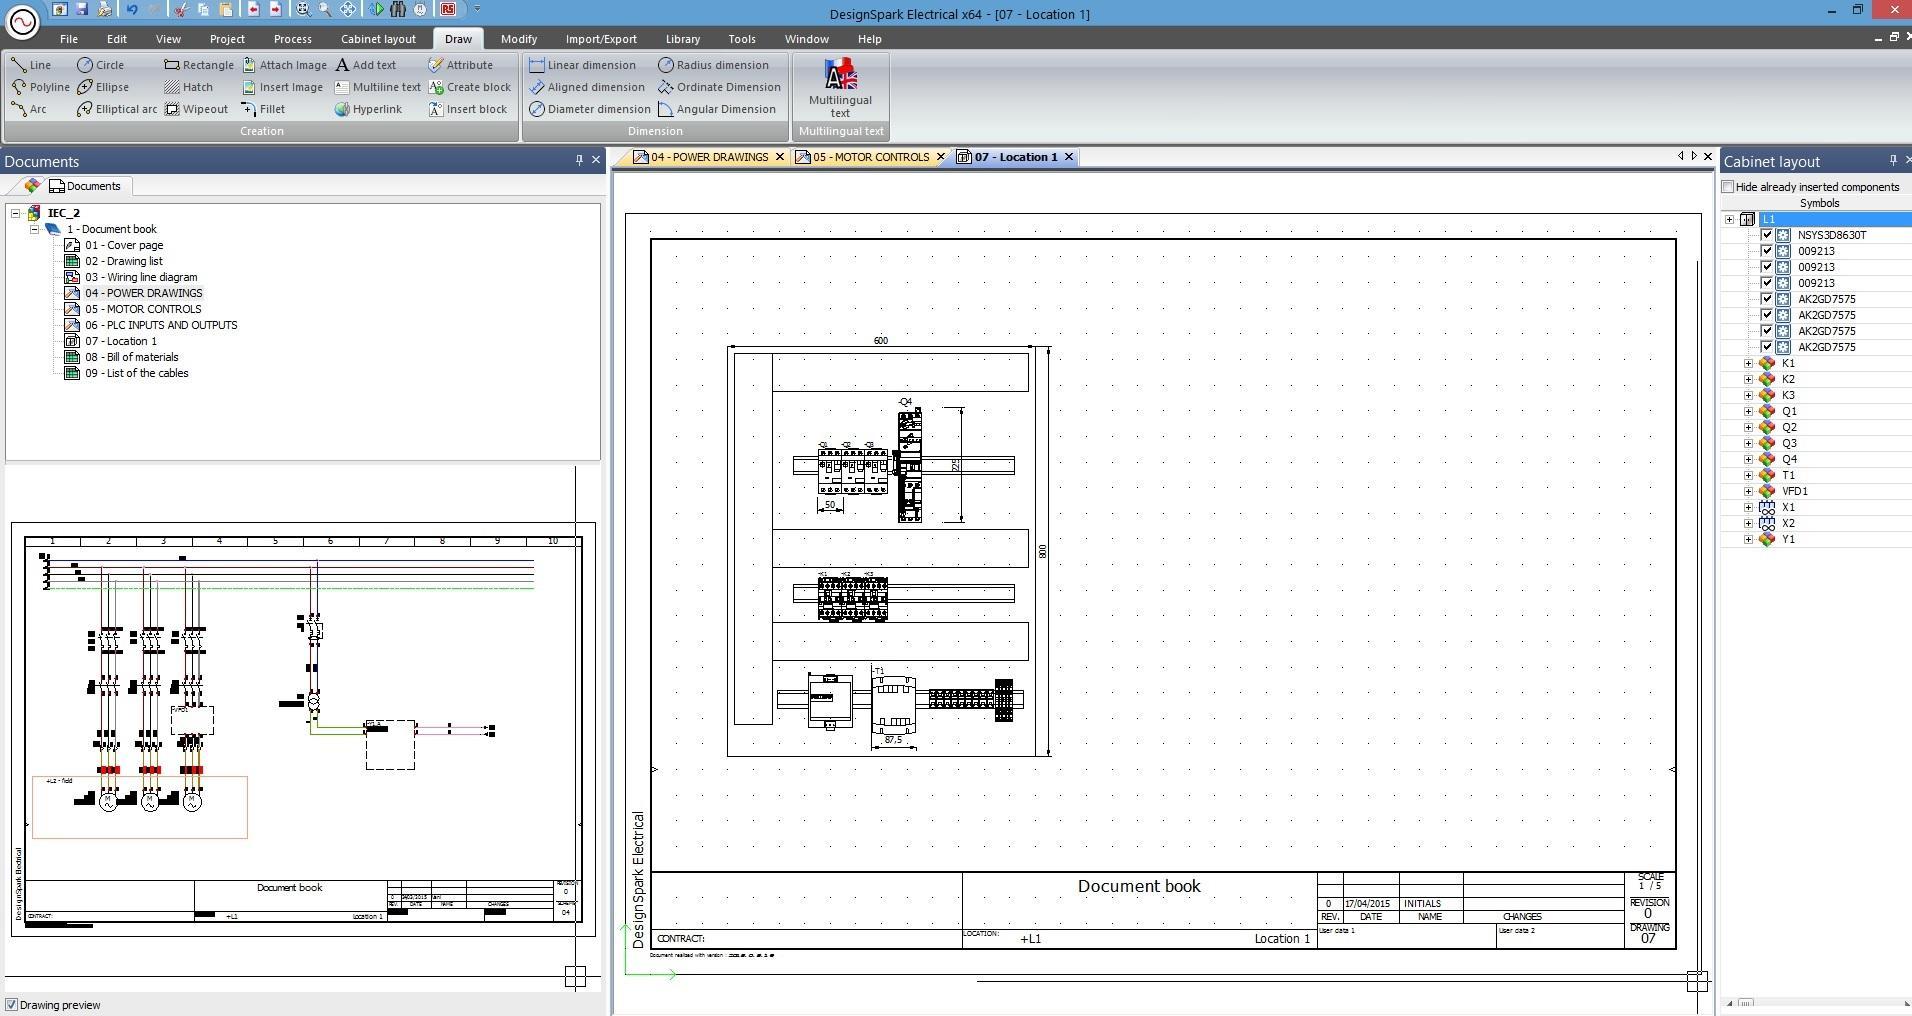 DesignSpark Electrical (64-bit)